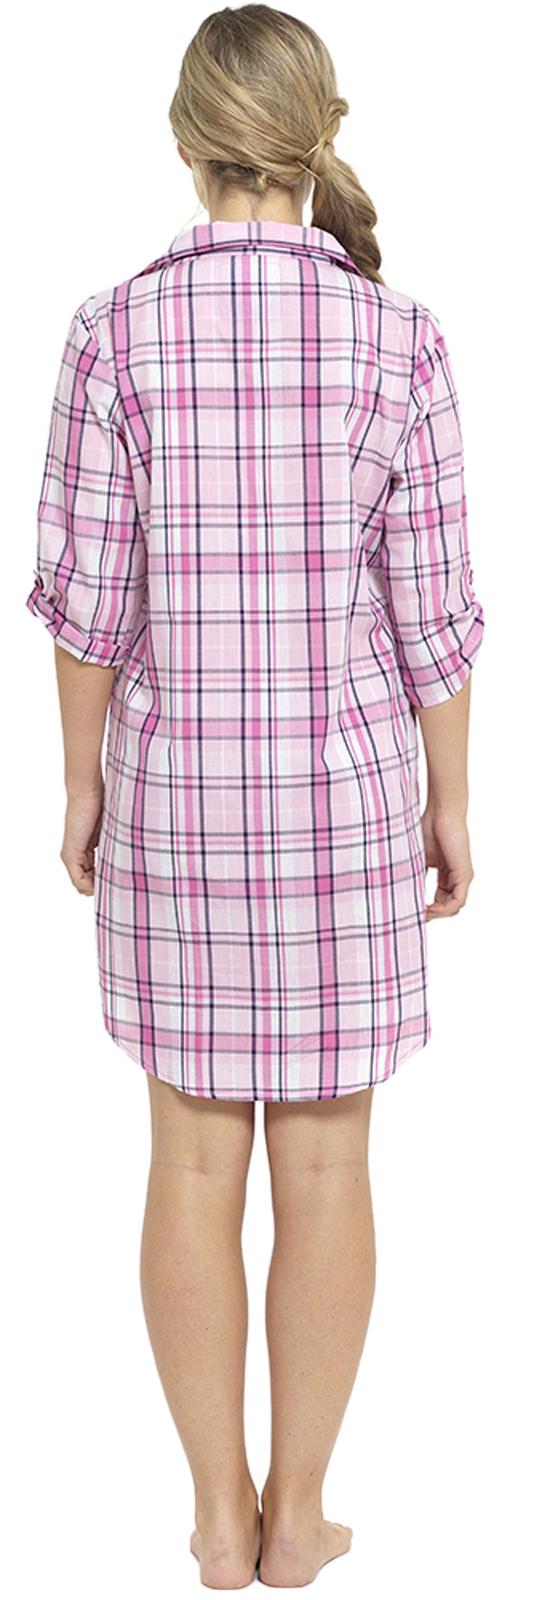 2b36fea5e0cb Womens Nightdress Check Nightshirt Nightie Nighty Nursing Pyjamas ...